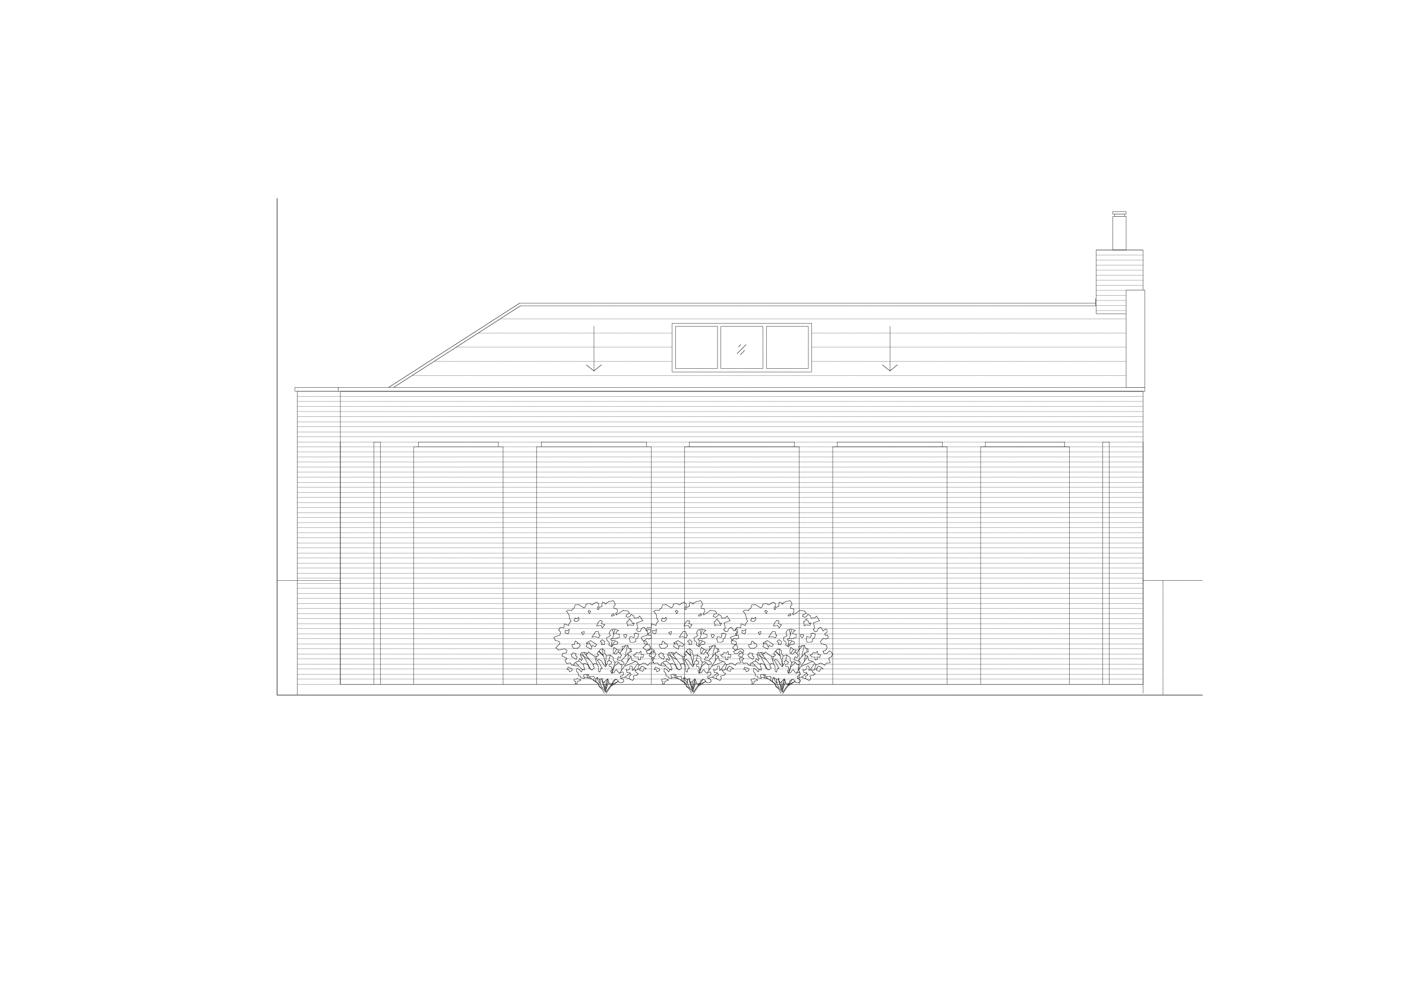 defoe-road-paper-house-project-the-design-emotive-24.jpg